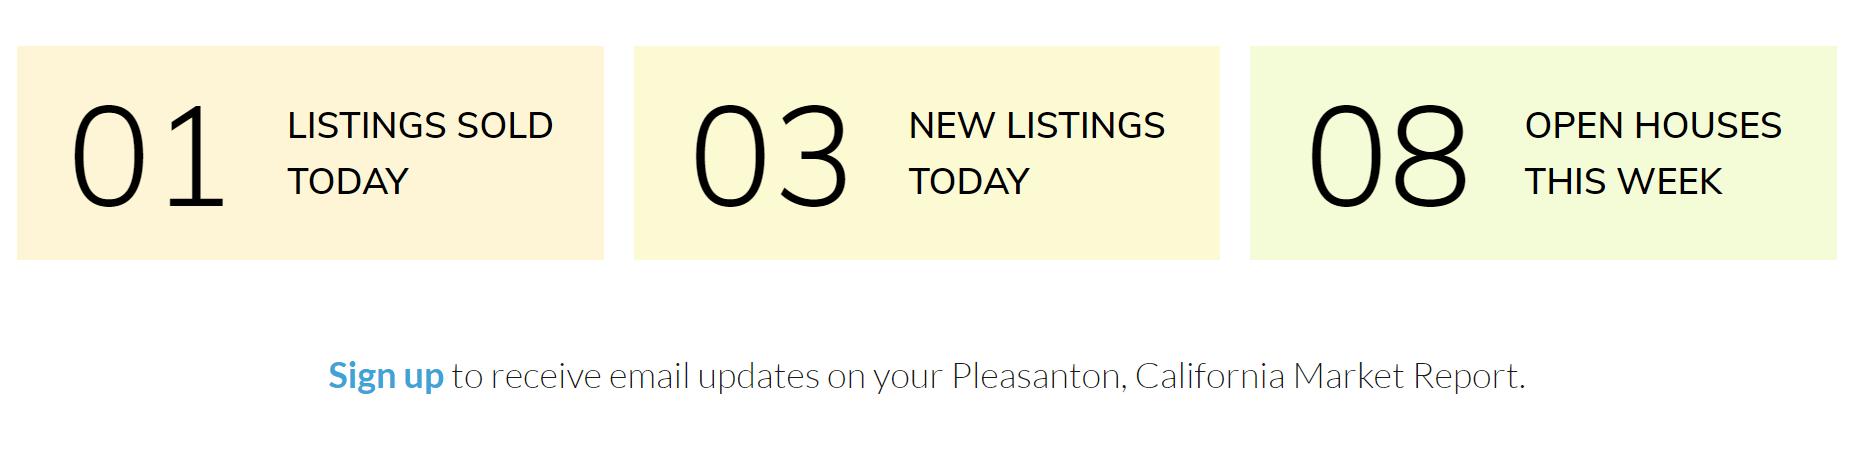 Pleasanton, California Market Report